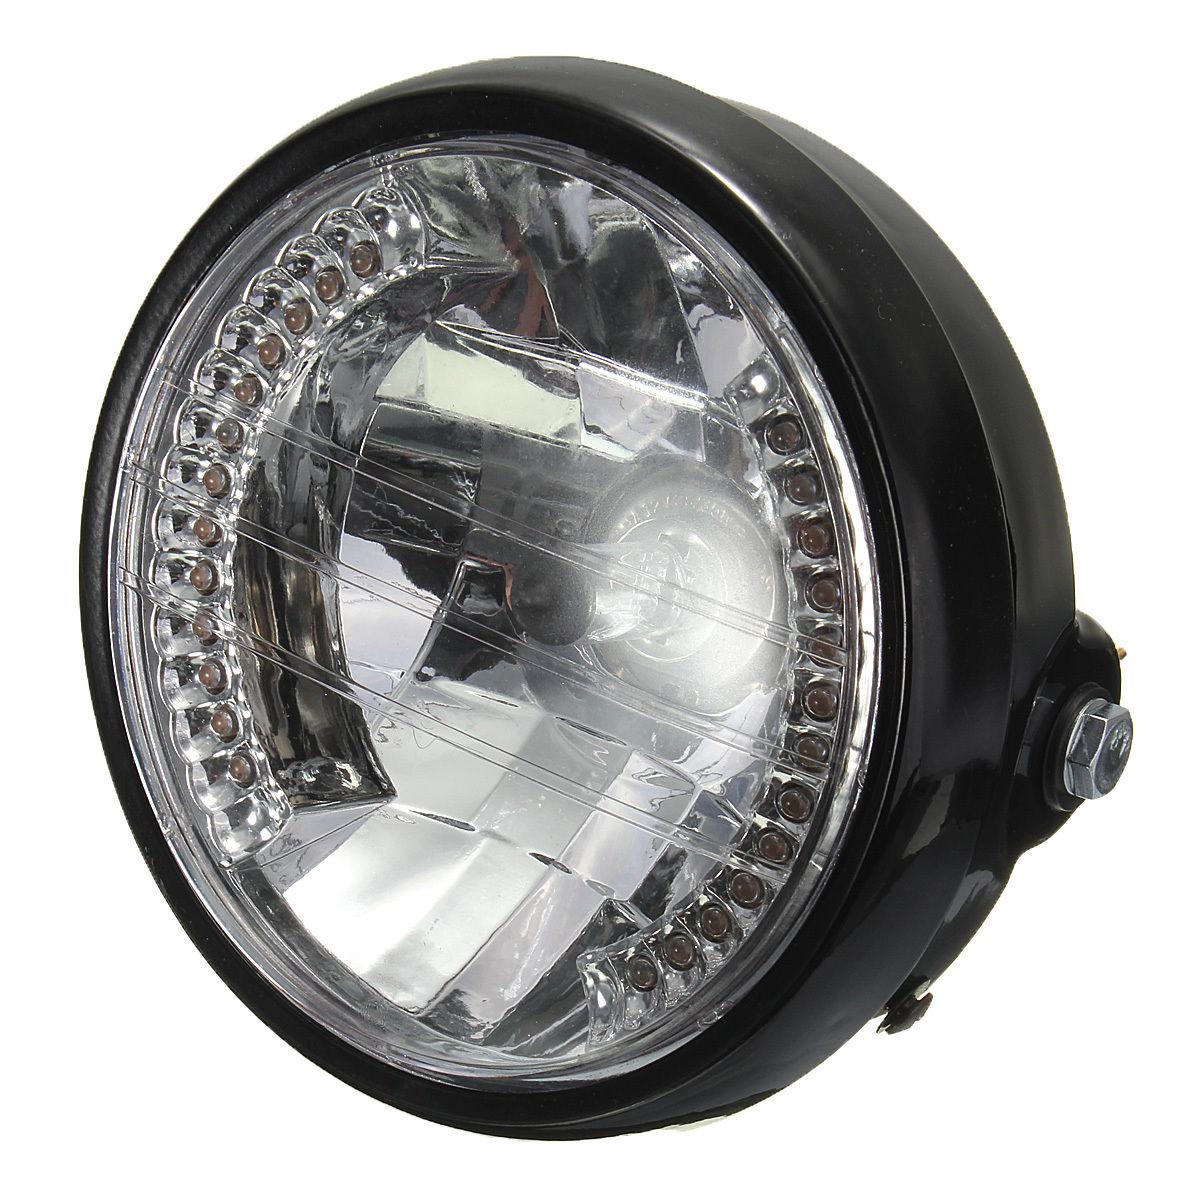 7 pouces phare de moto rond halogene lampe h4 ampoule phare pour harley bobberwt ebay. Black Bedroom Furniture Sets. Home Design Ideas